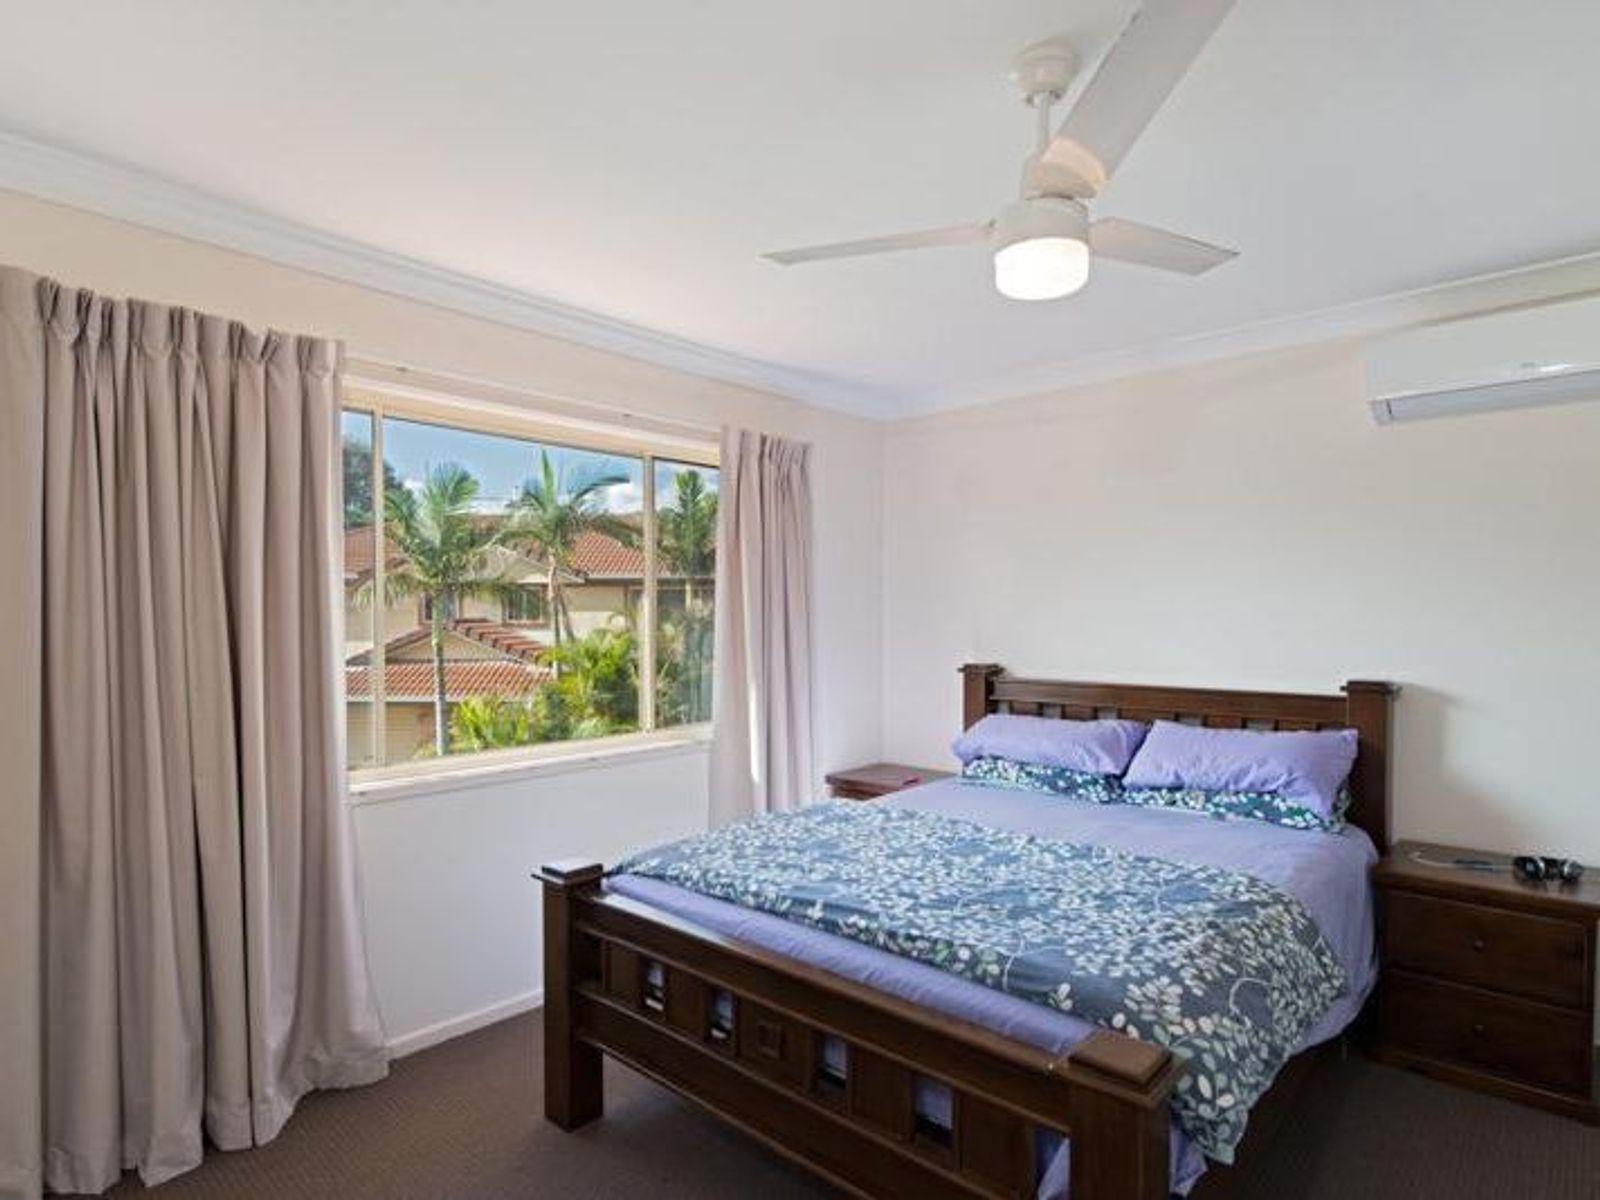 28/9 Bayside Court, Thorneside, QLD 4158